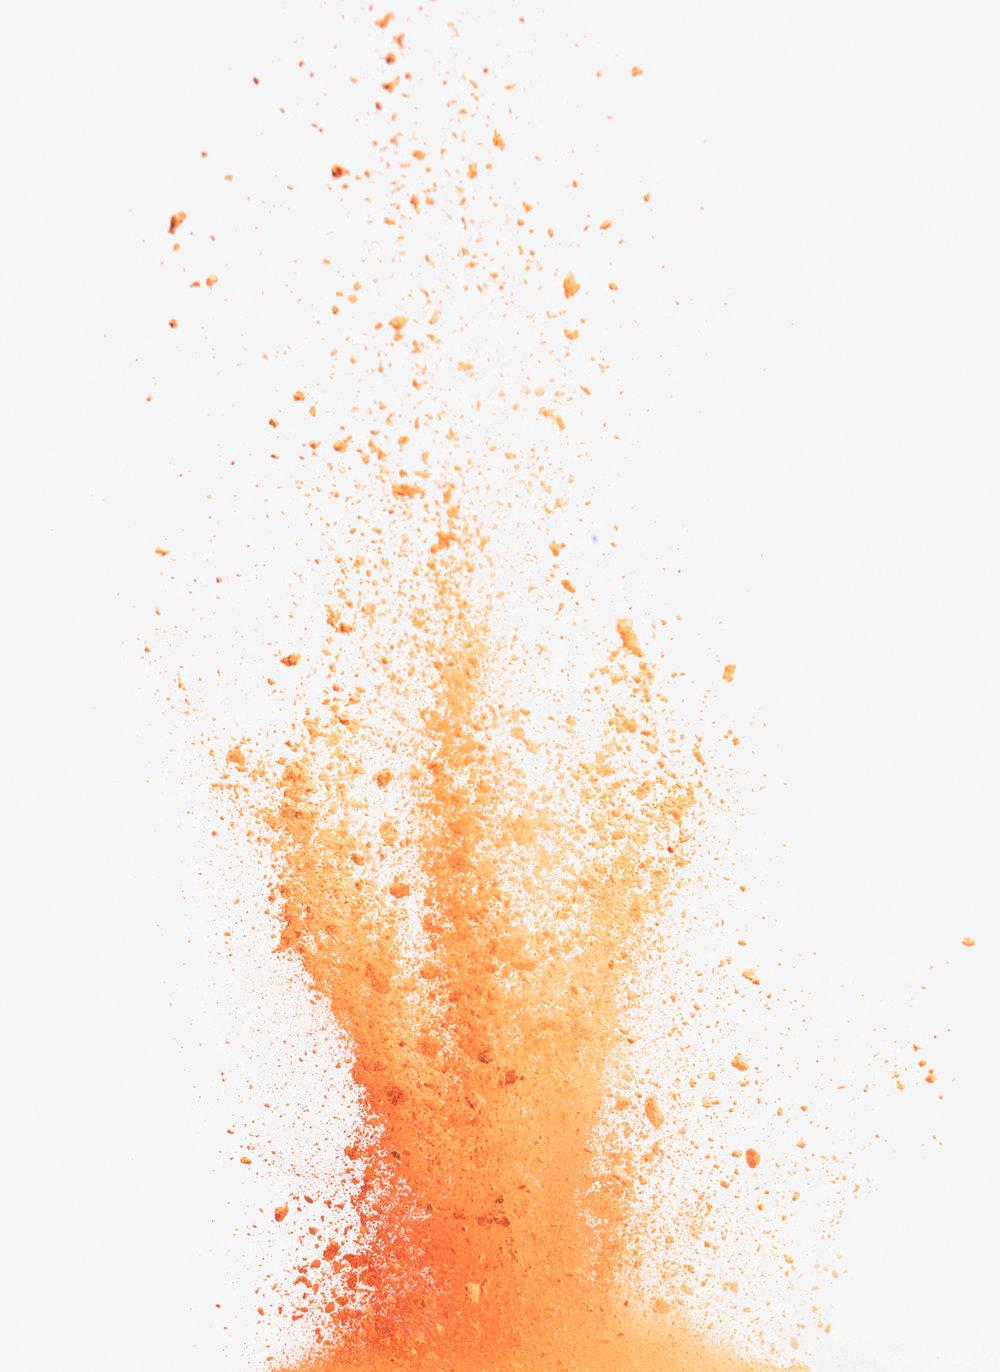 Lux-Liquid-Motion-Photography-High-Speed-Portfolio-13.jpg